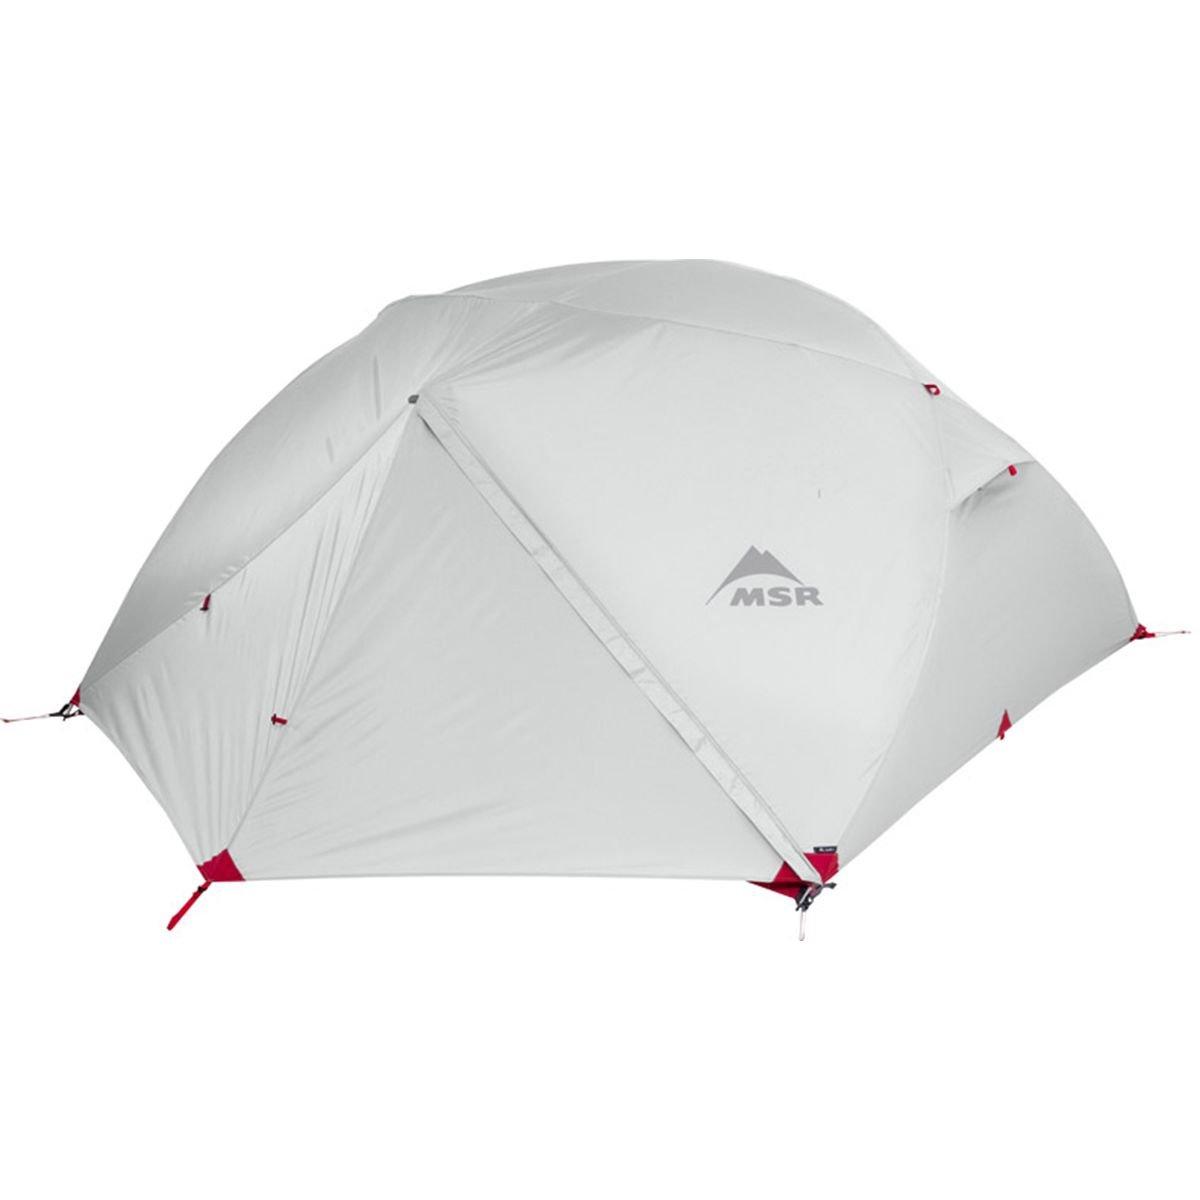 MSR Elixir 4-Person Lightweight Backpacking Tent by MSR (Image #5)